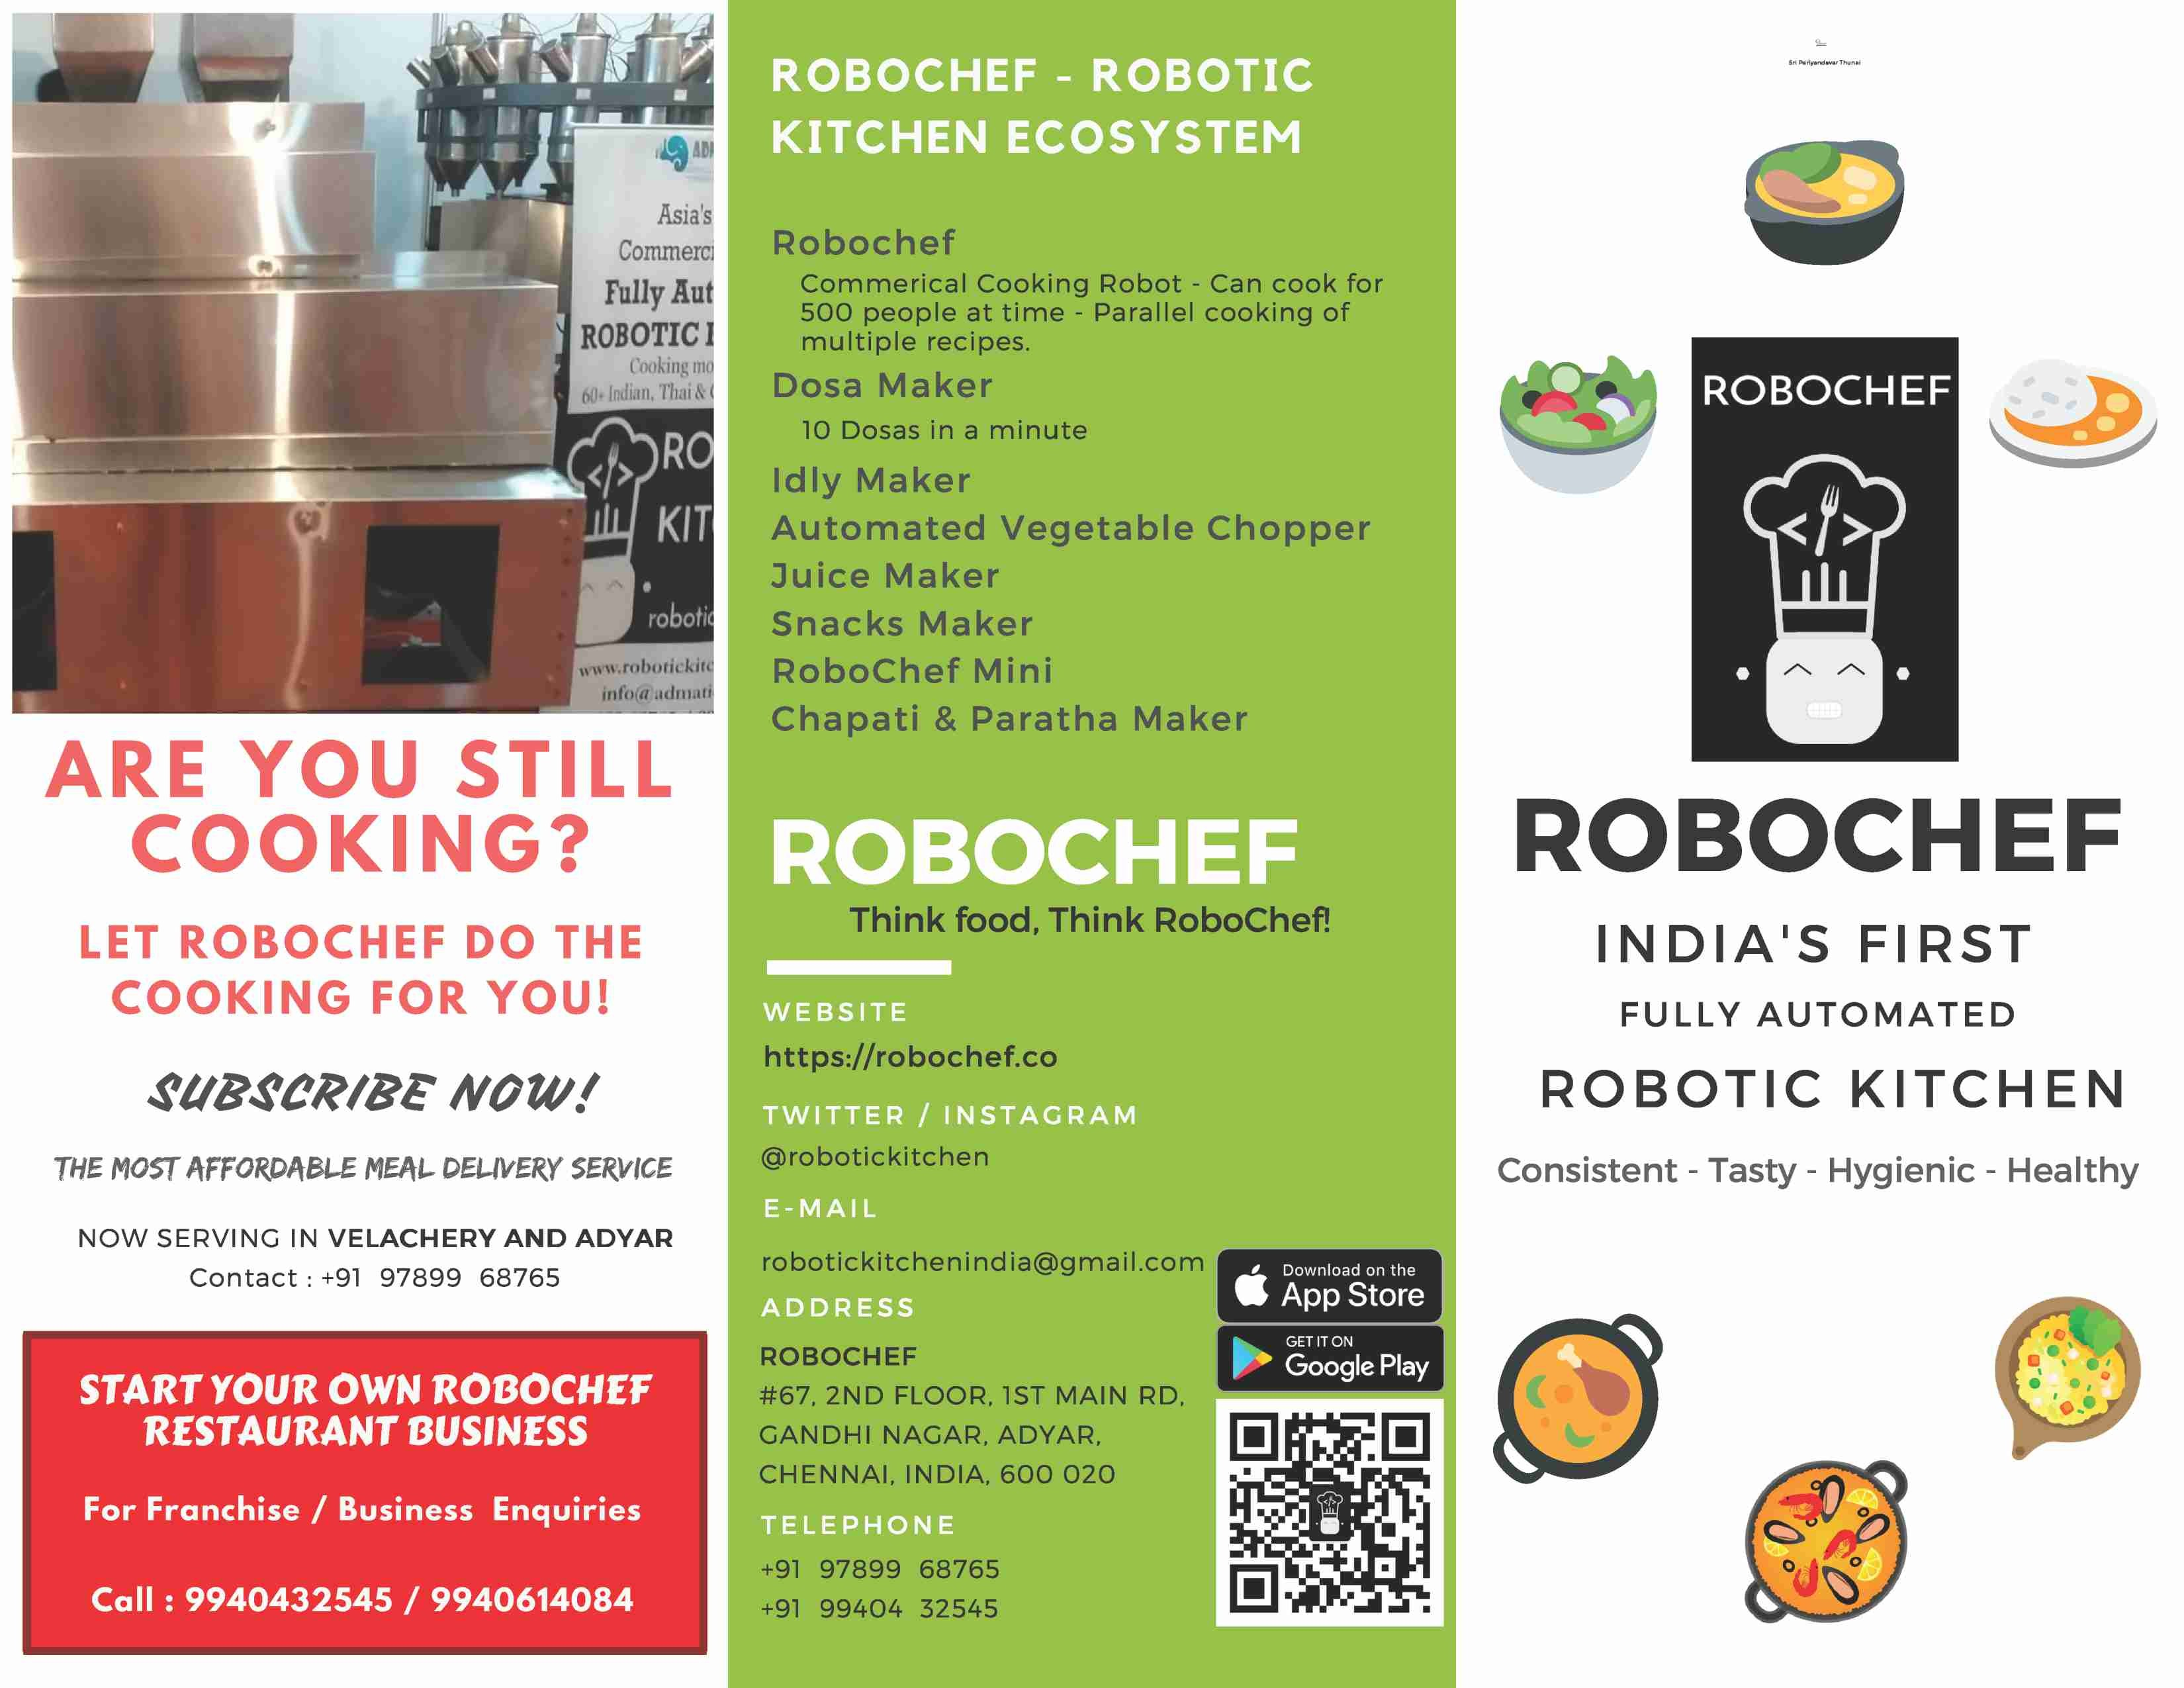 RoboChef - Robotic Kitchen | LinkedIn